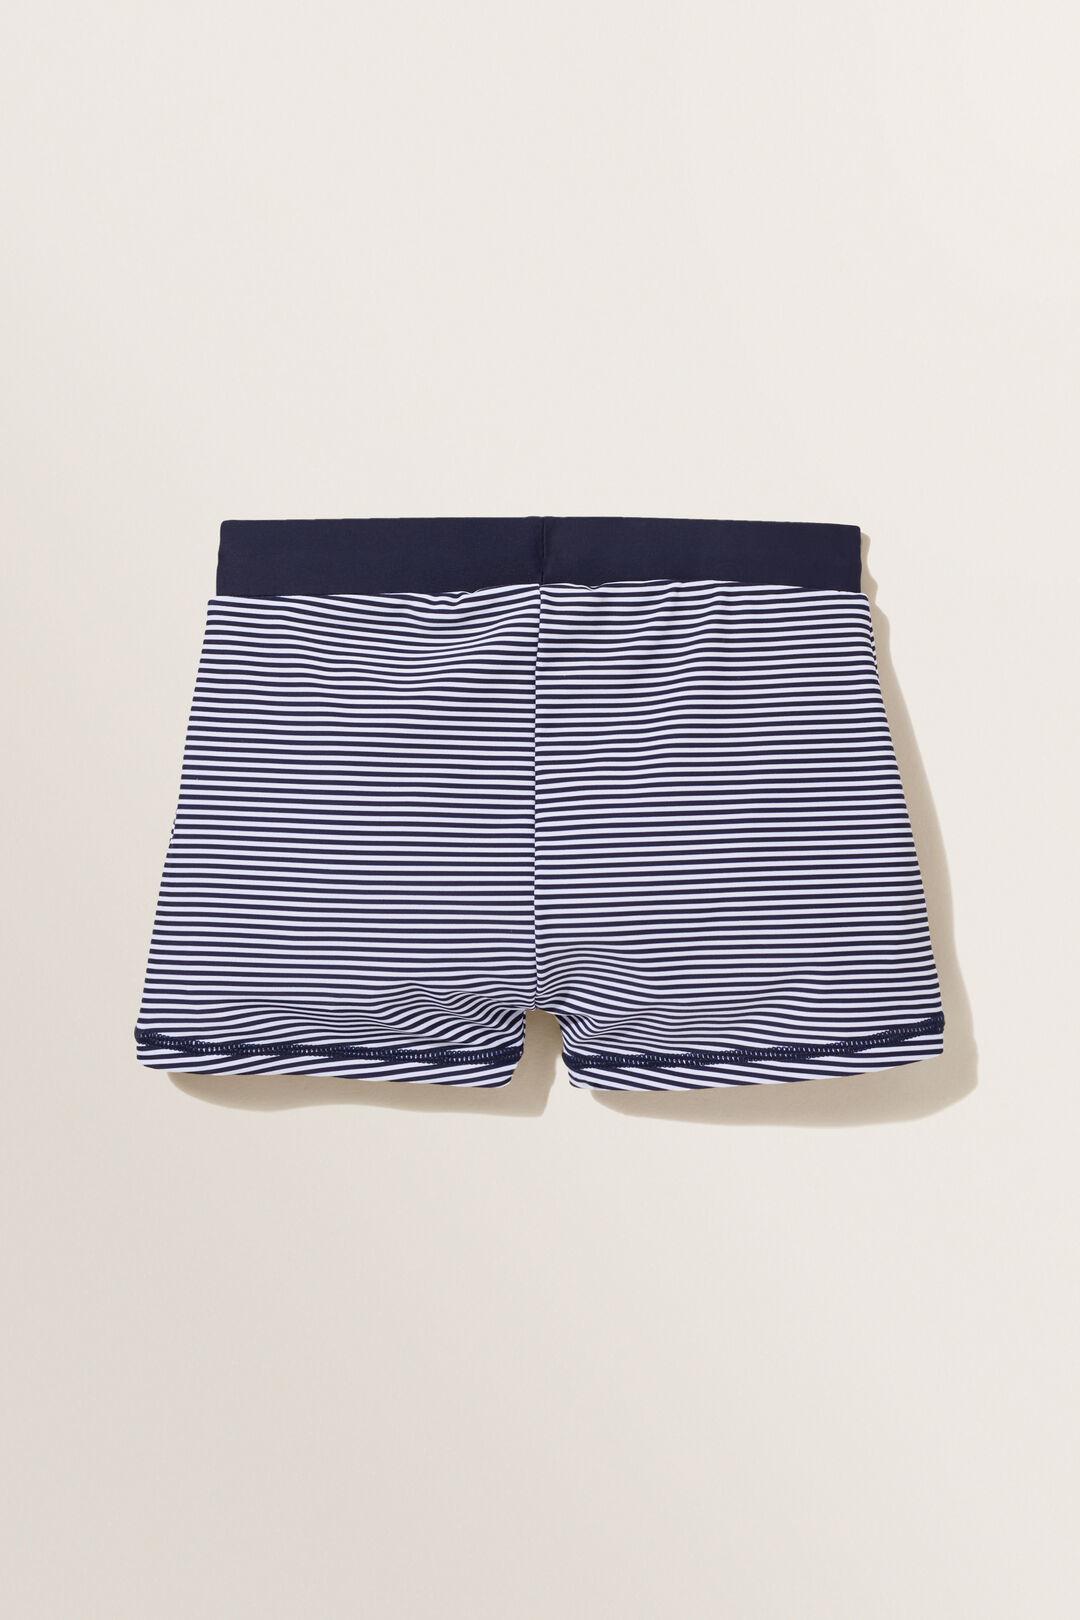 Logo Swim Shorts  Midnight Blue  hi-res